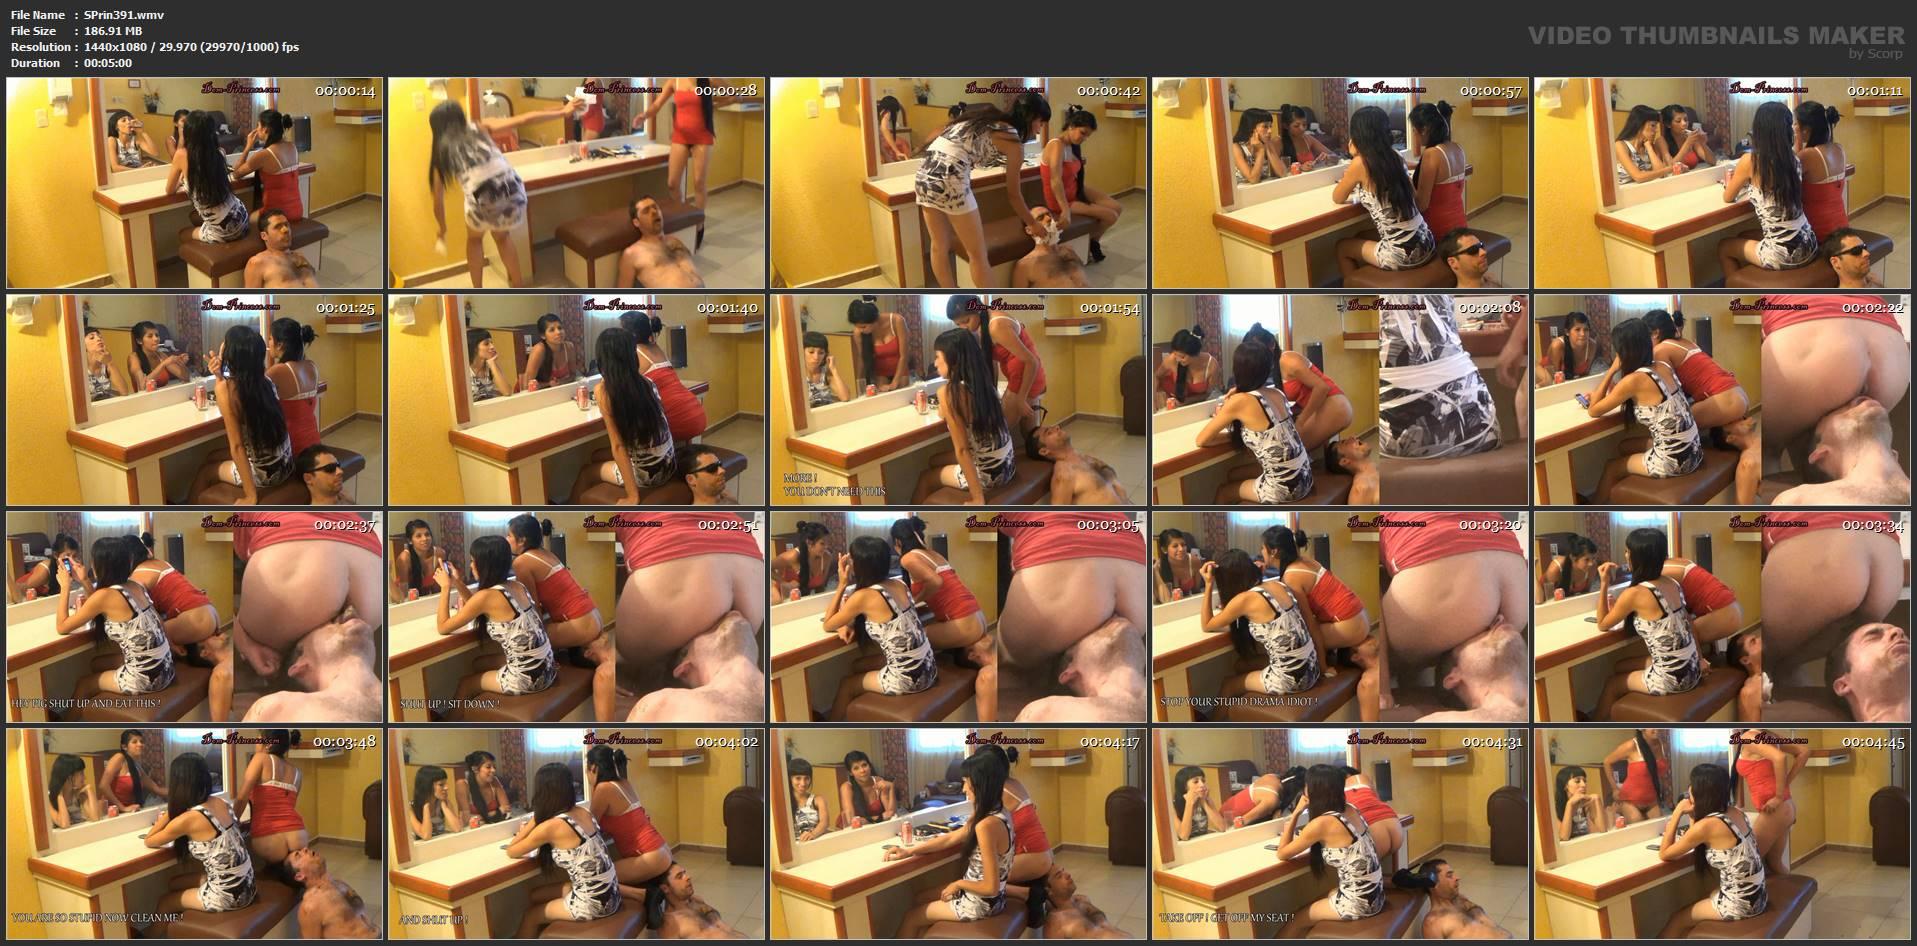 [SCAT-PRINCESS] First Time Slave Part 3 Samantha [FULL HD][1080p][WMV]